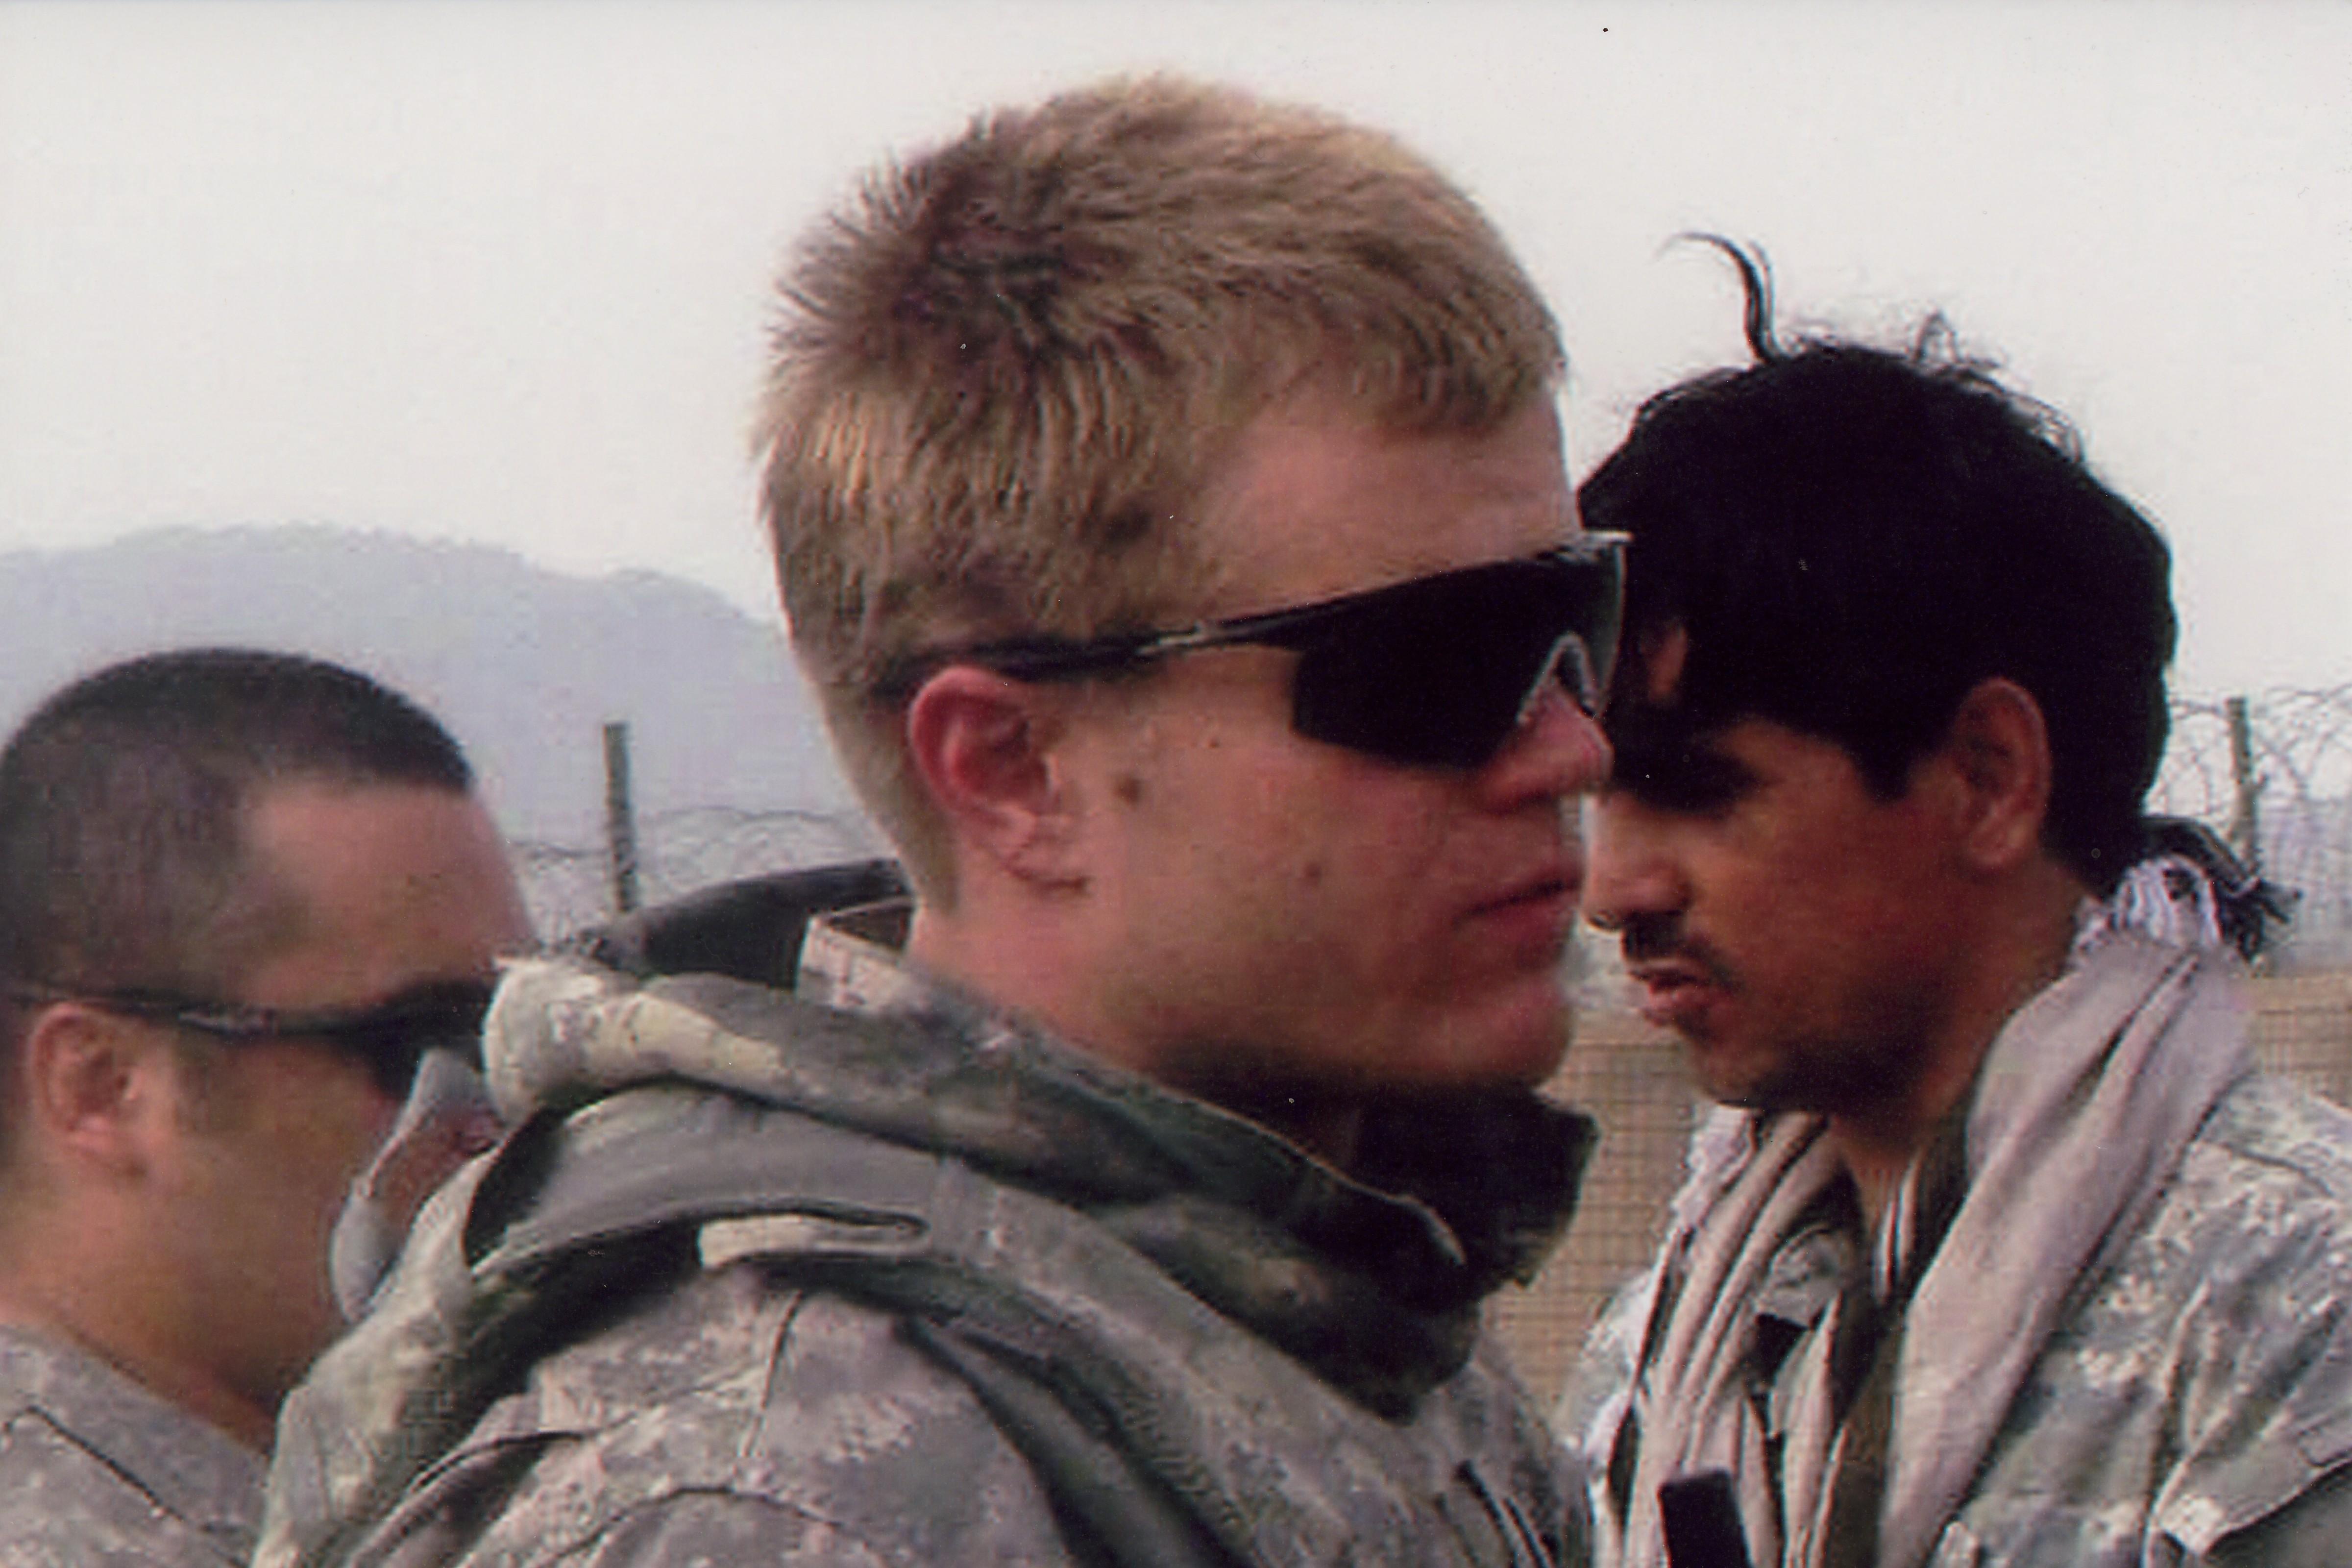 362-Afghanistan_1